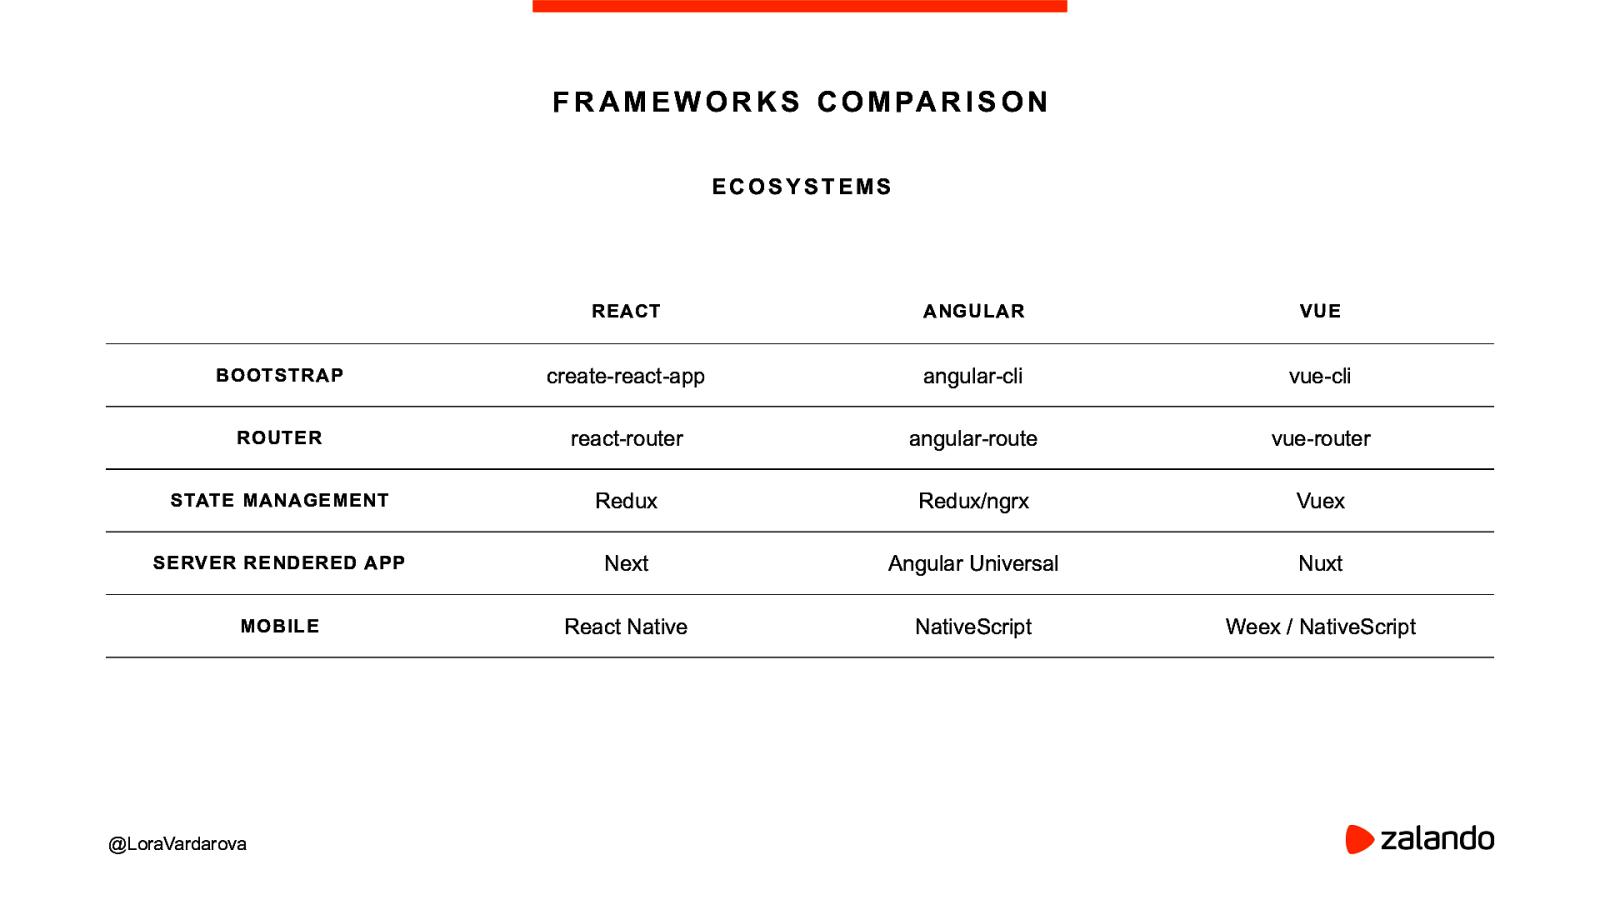 Battle of the Frameworks